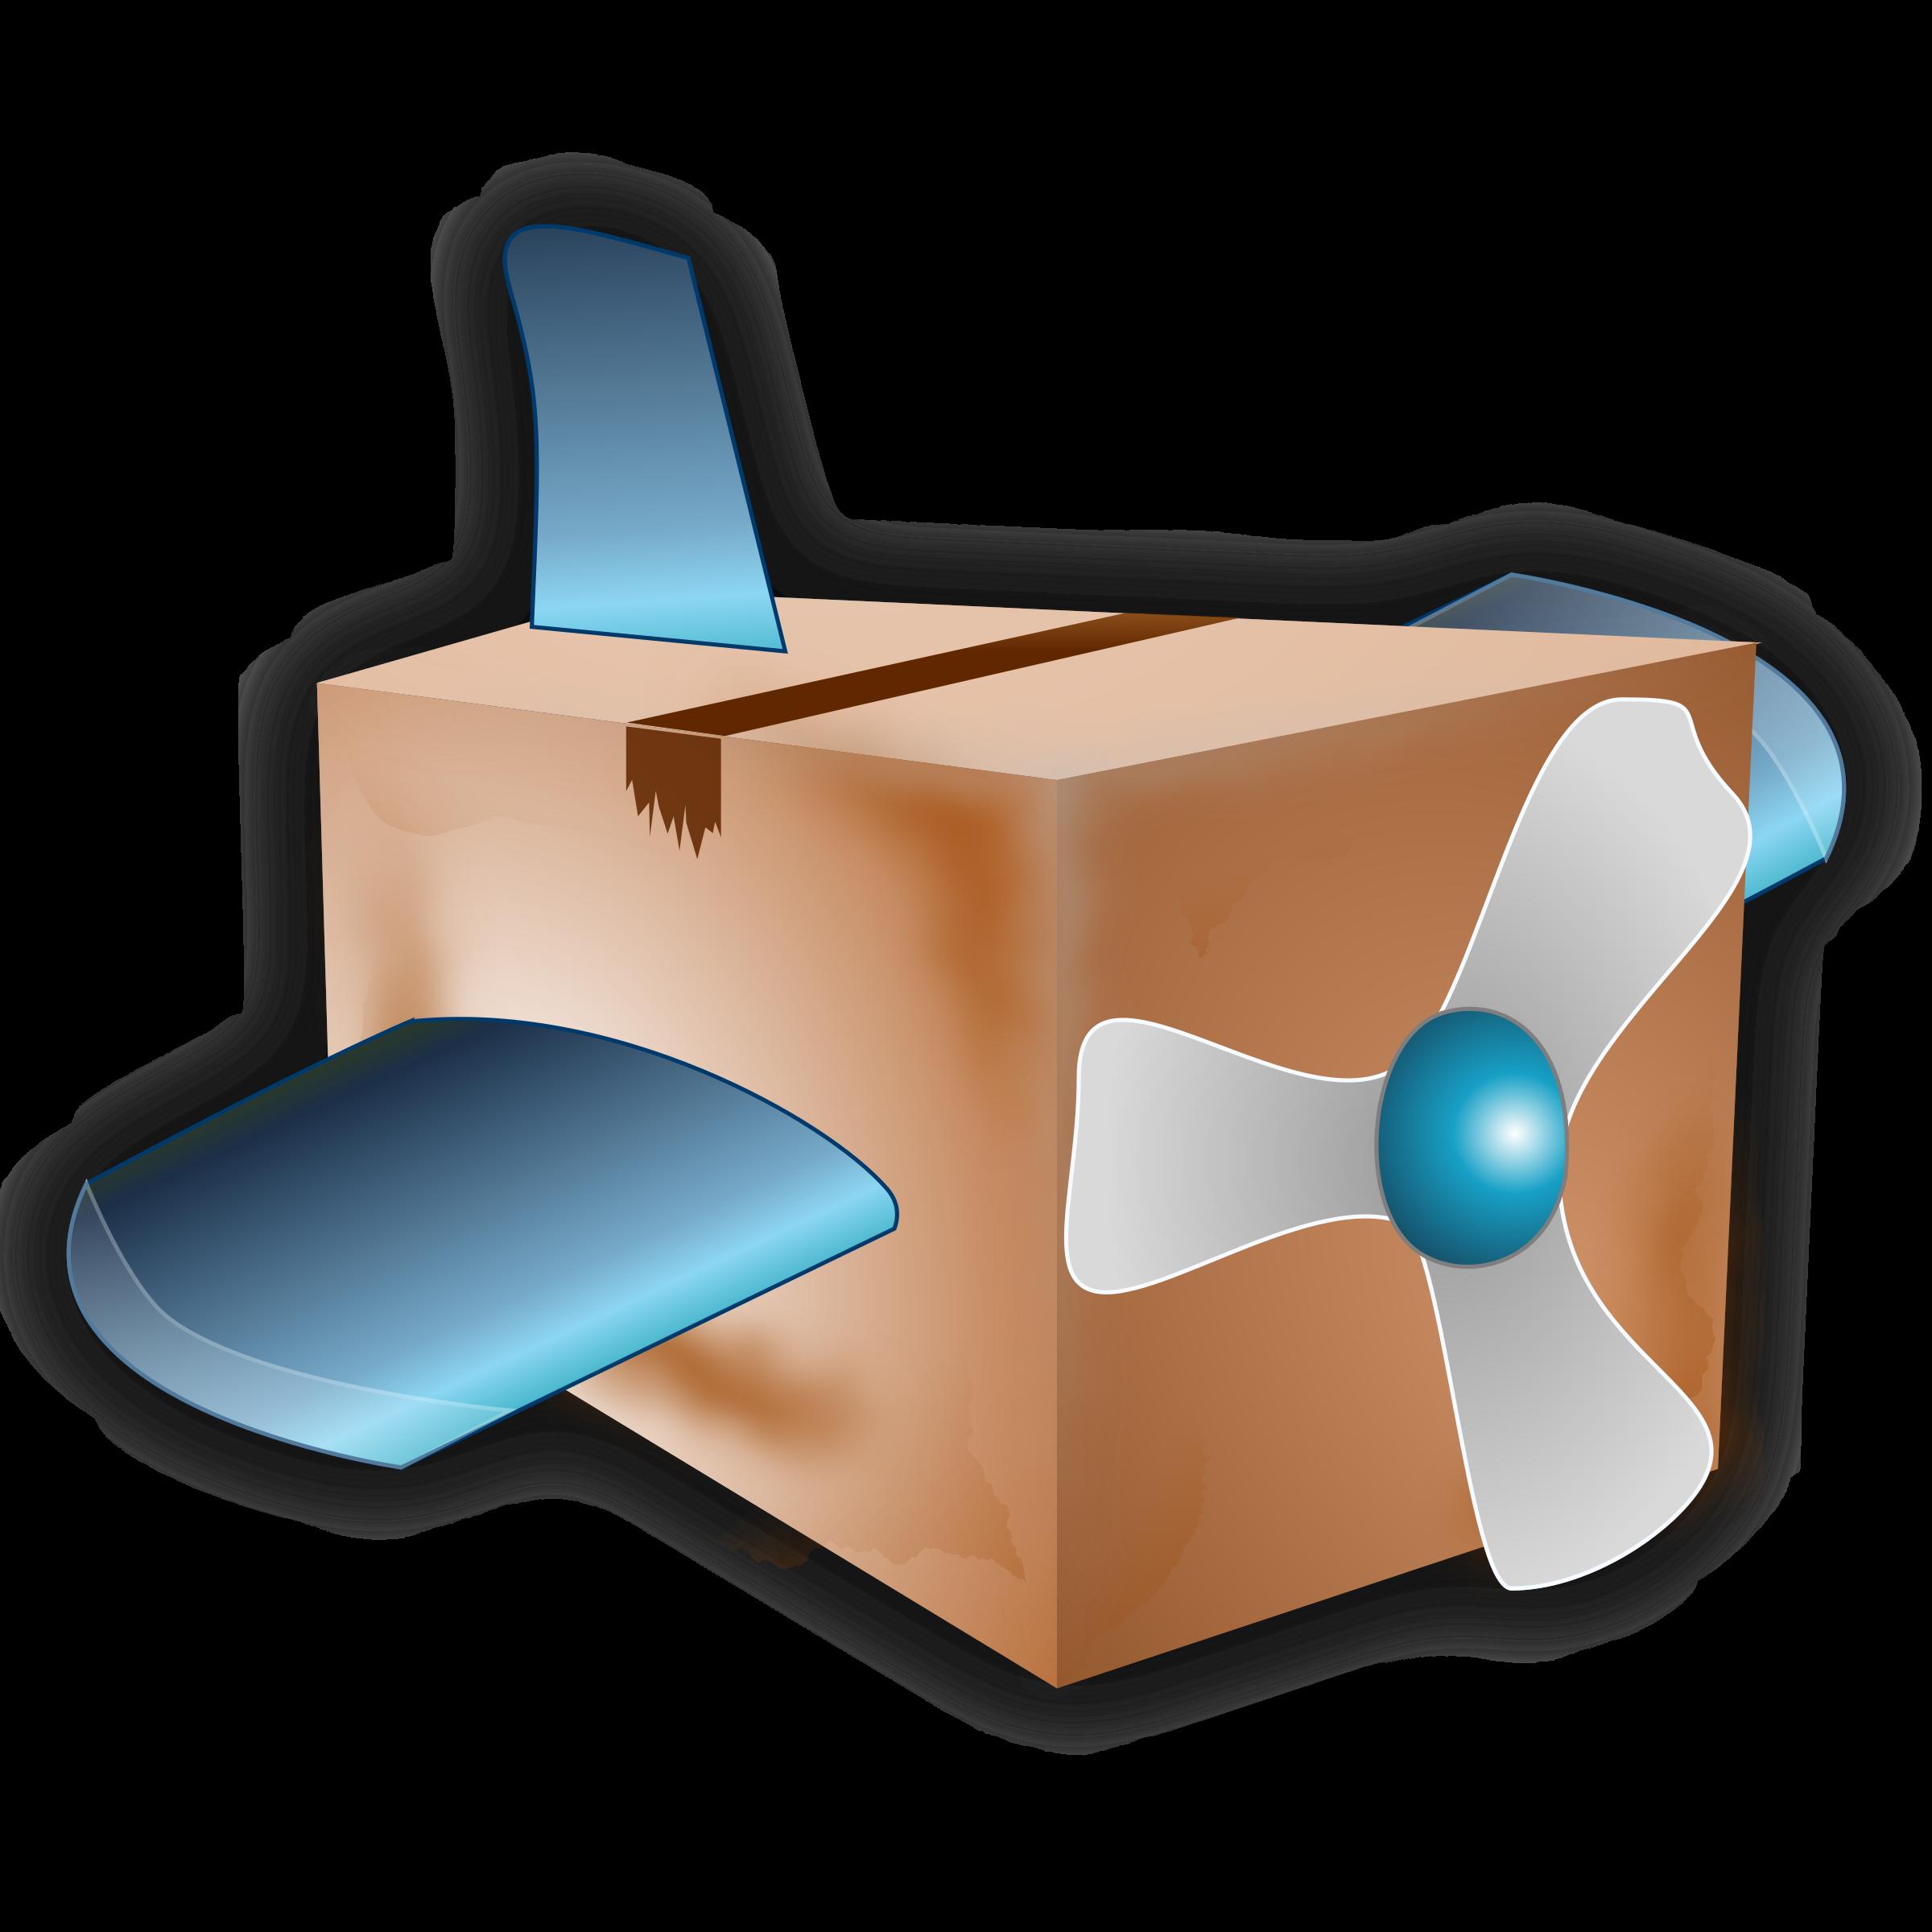 Clipart box shoe box. Carton engine big image